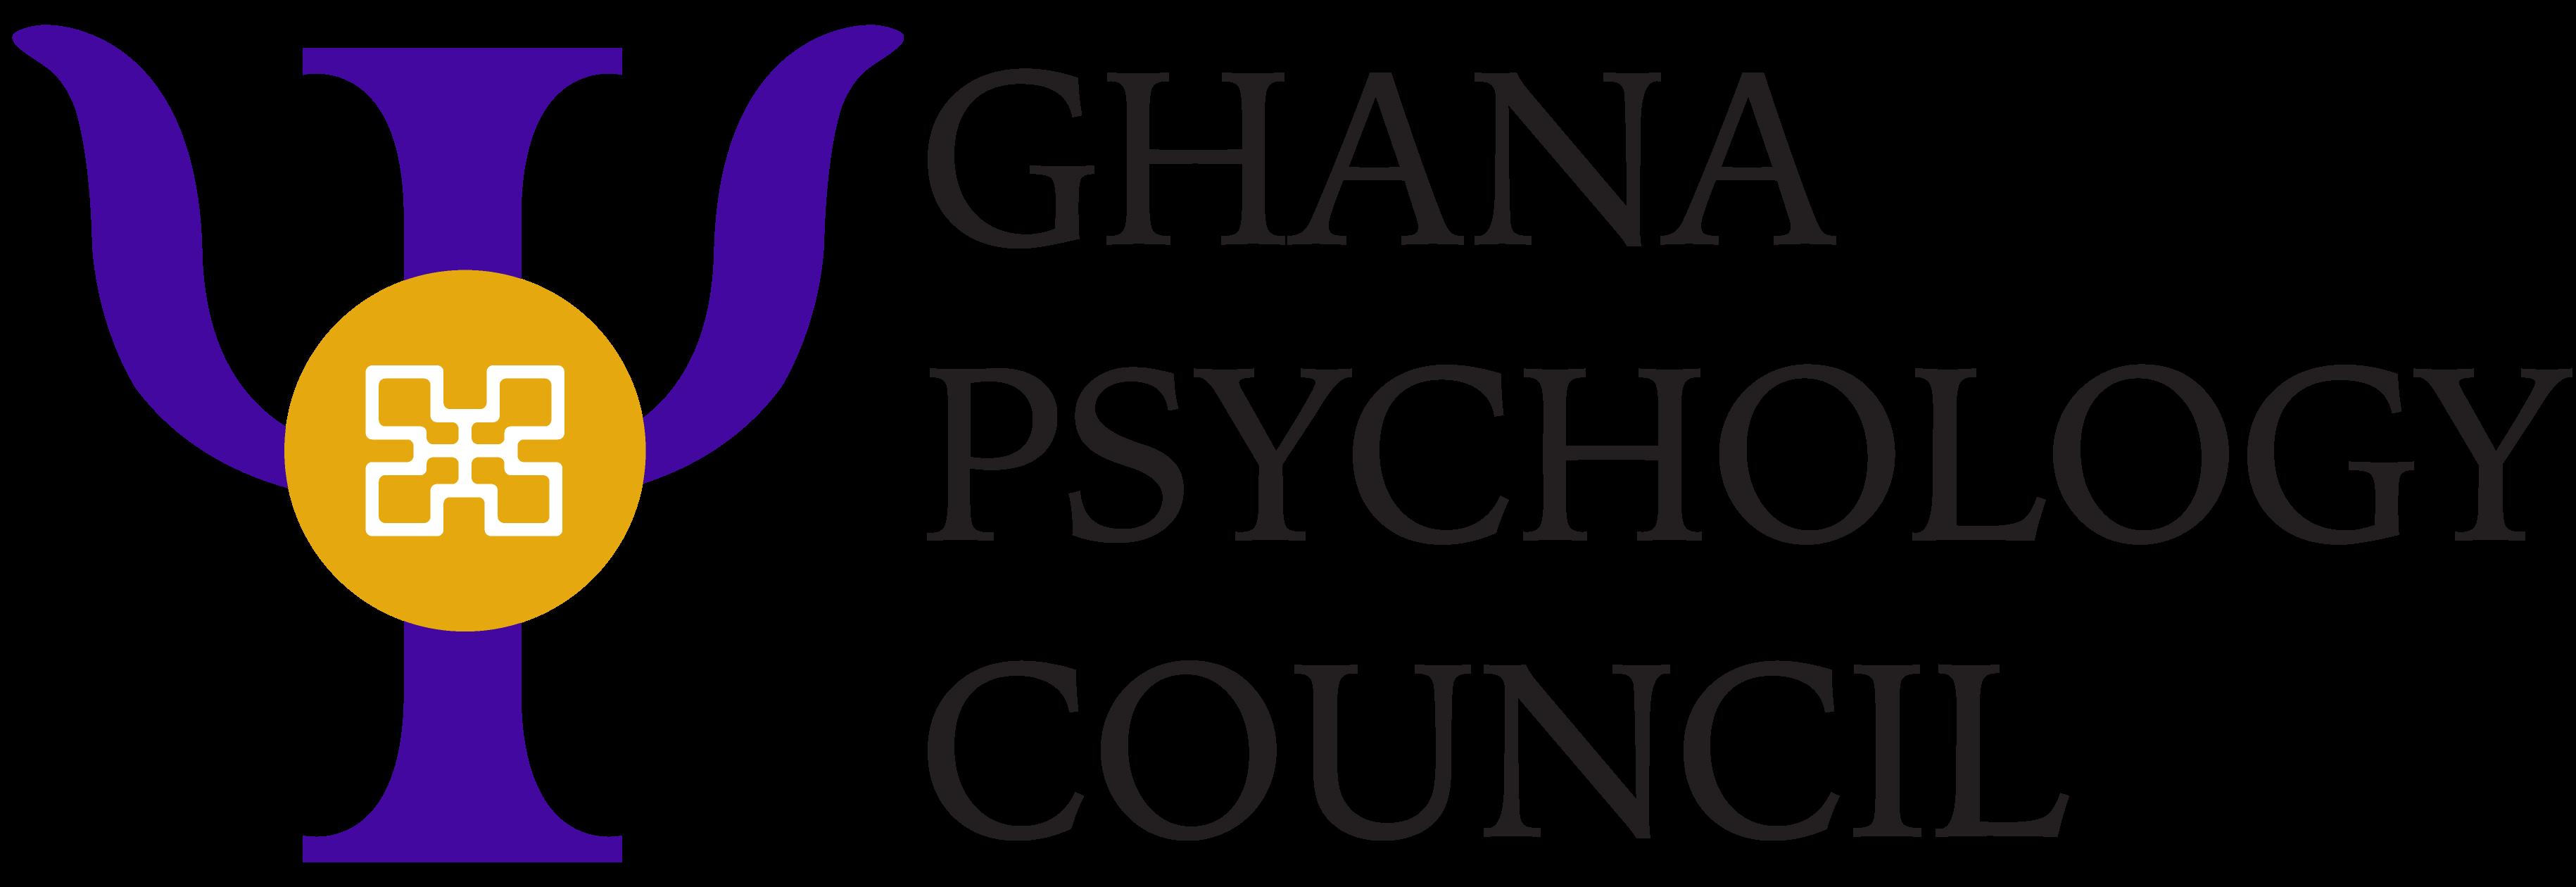 PSYCHOLOGY COUNCIL